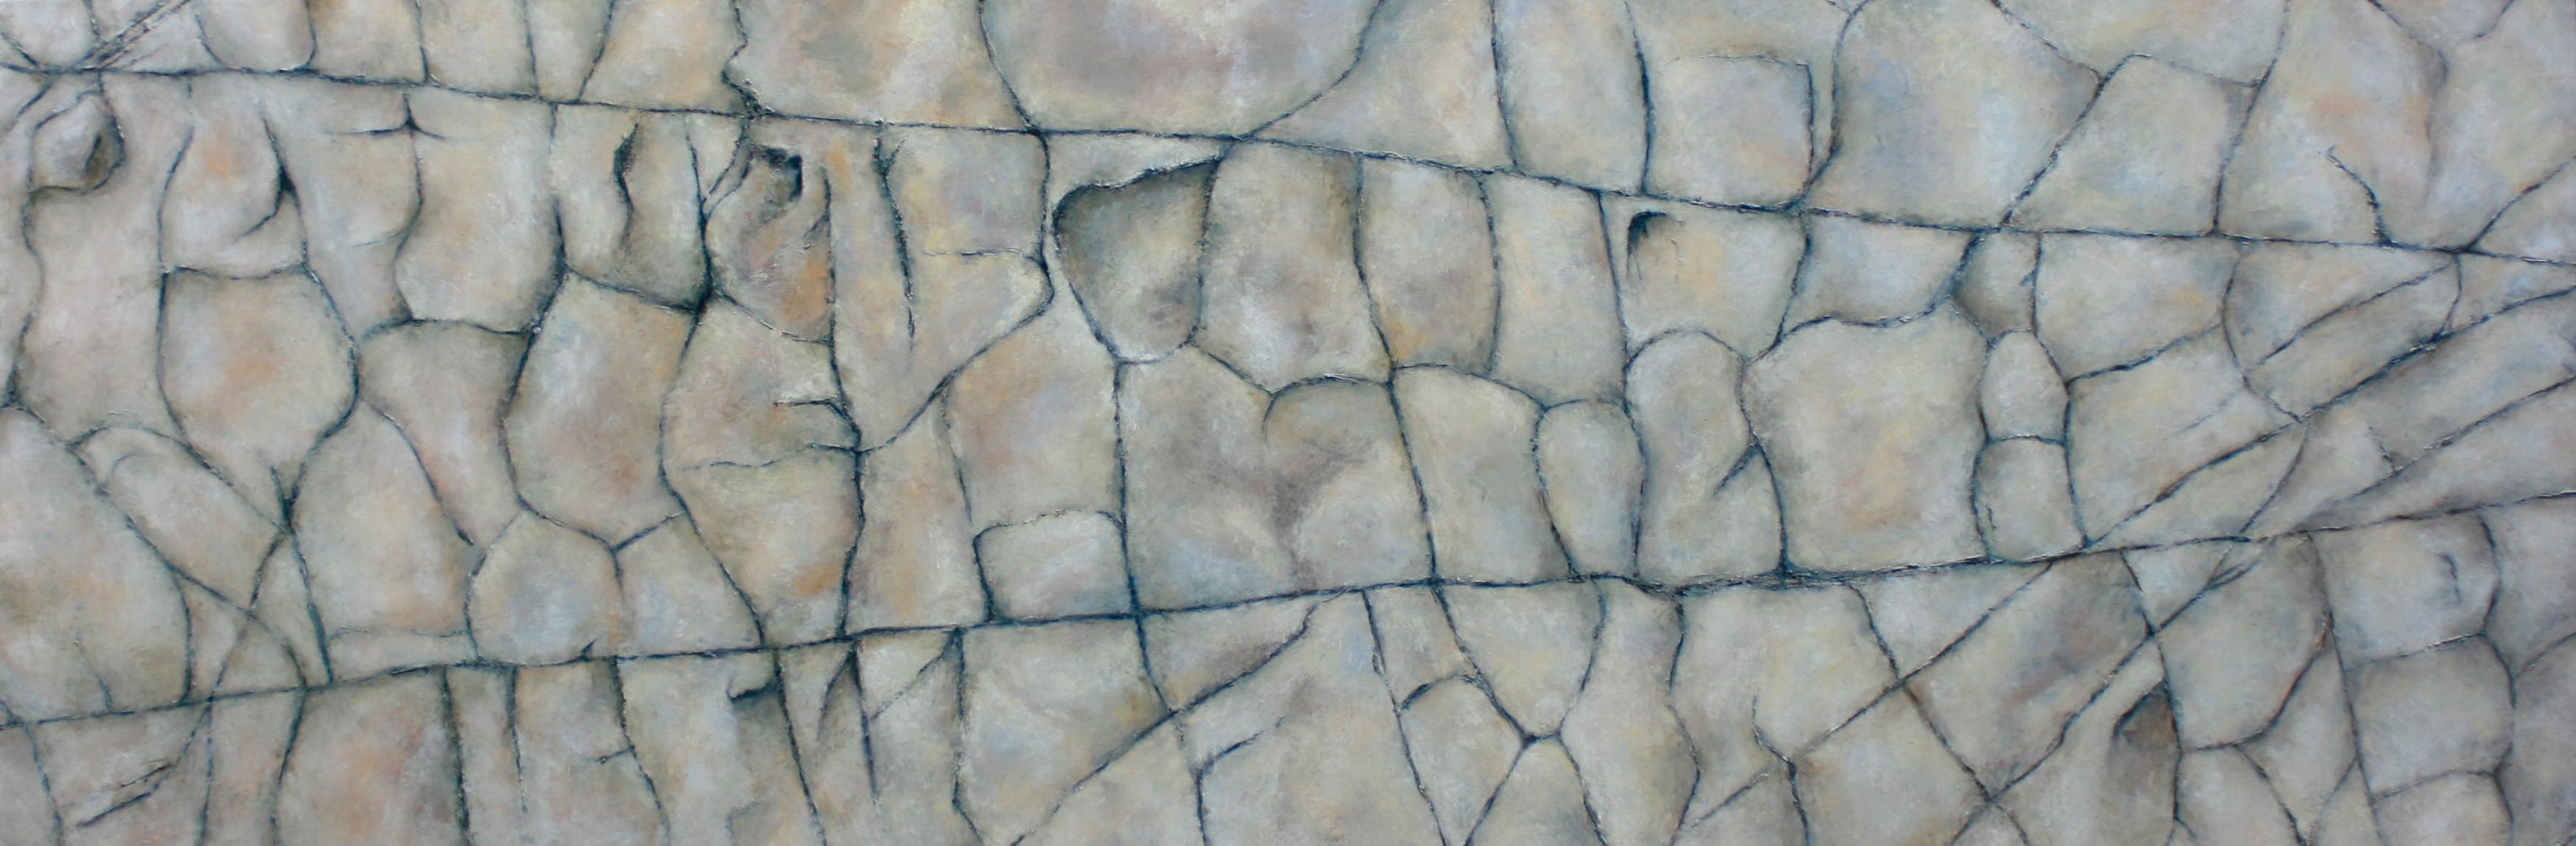 Kimmeridge Rocks 4